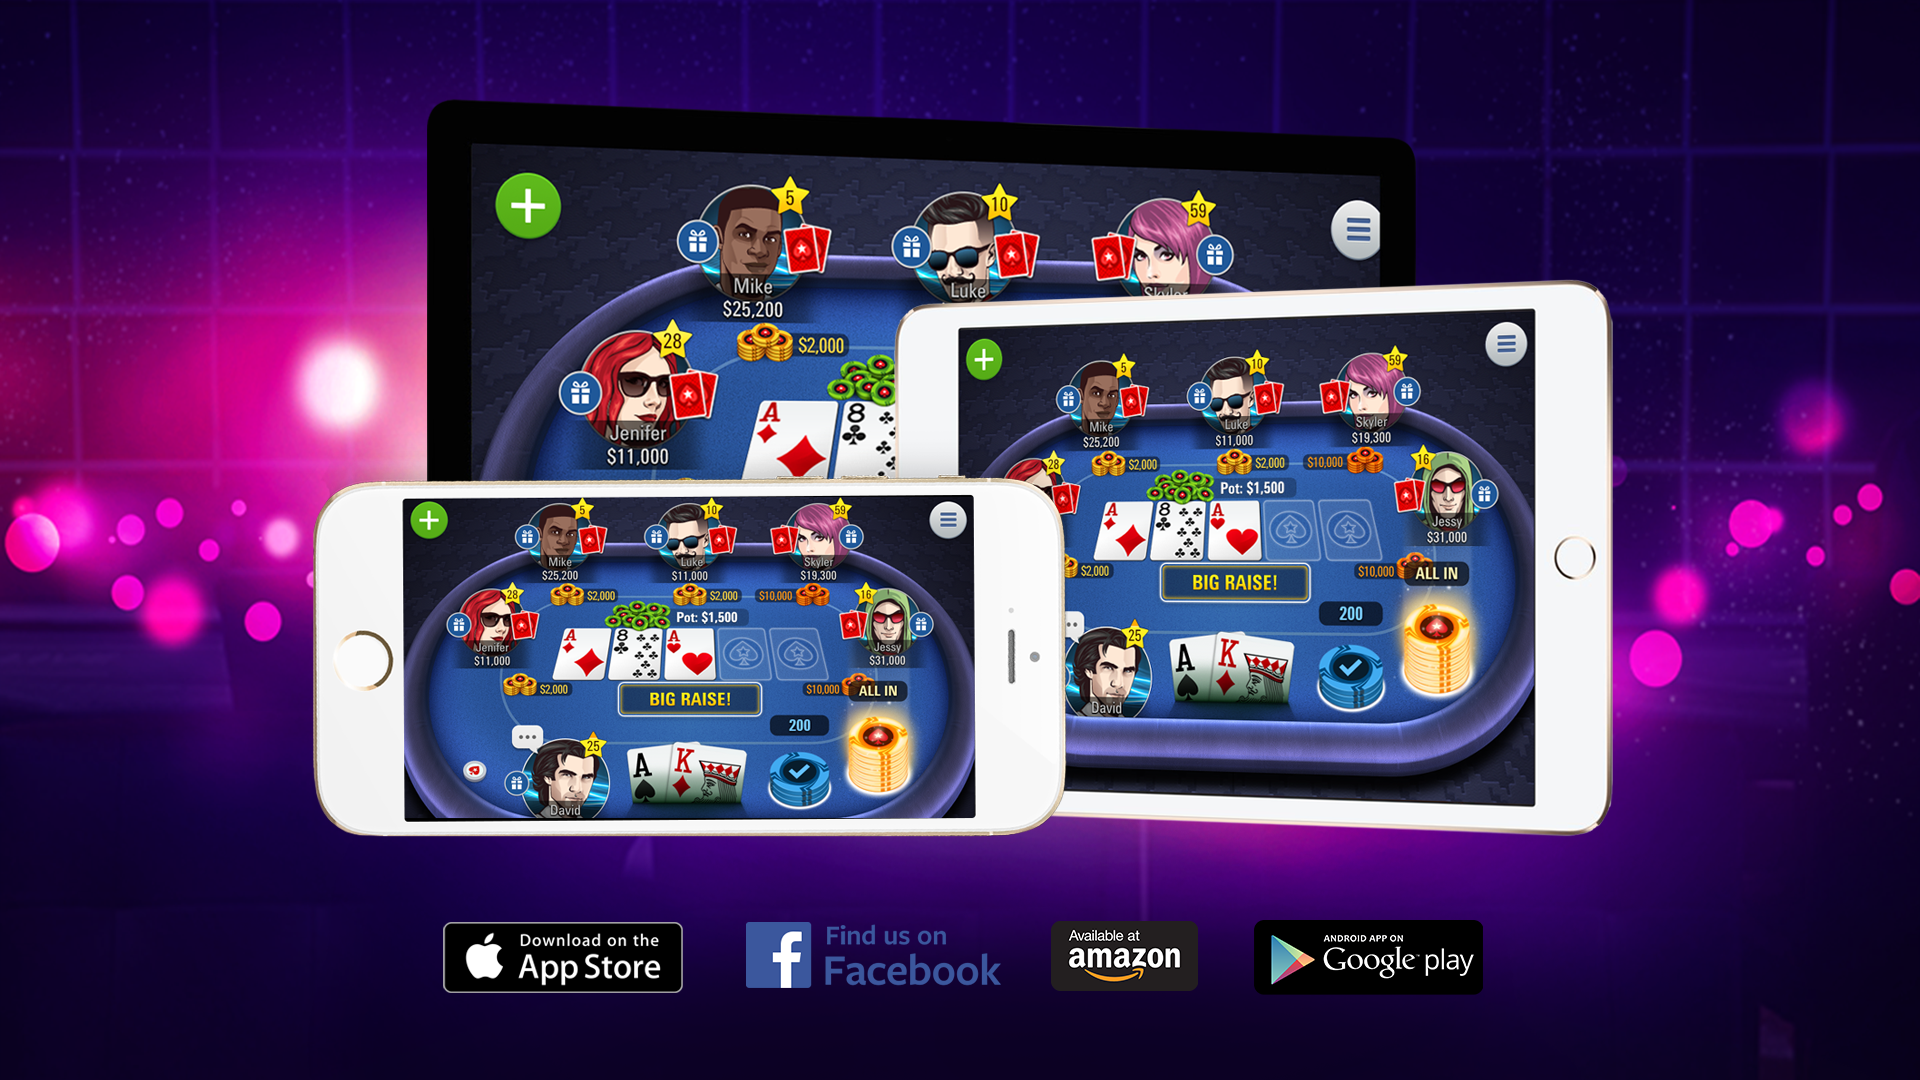 pokerstars eu apk download